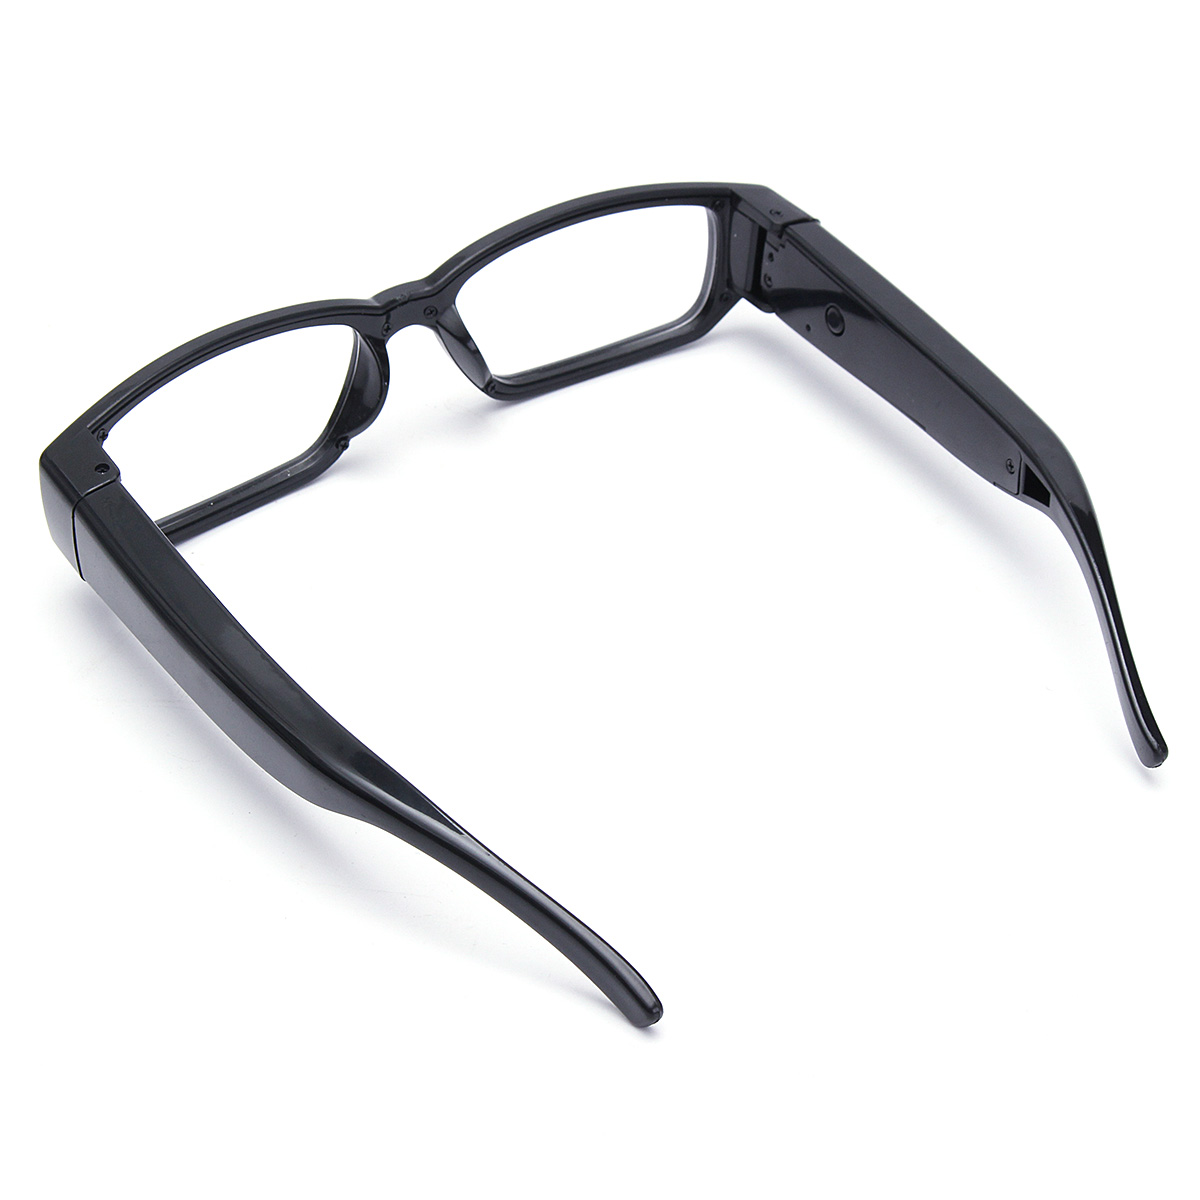 Secret Sunglasses Mini Camera